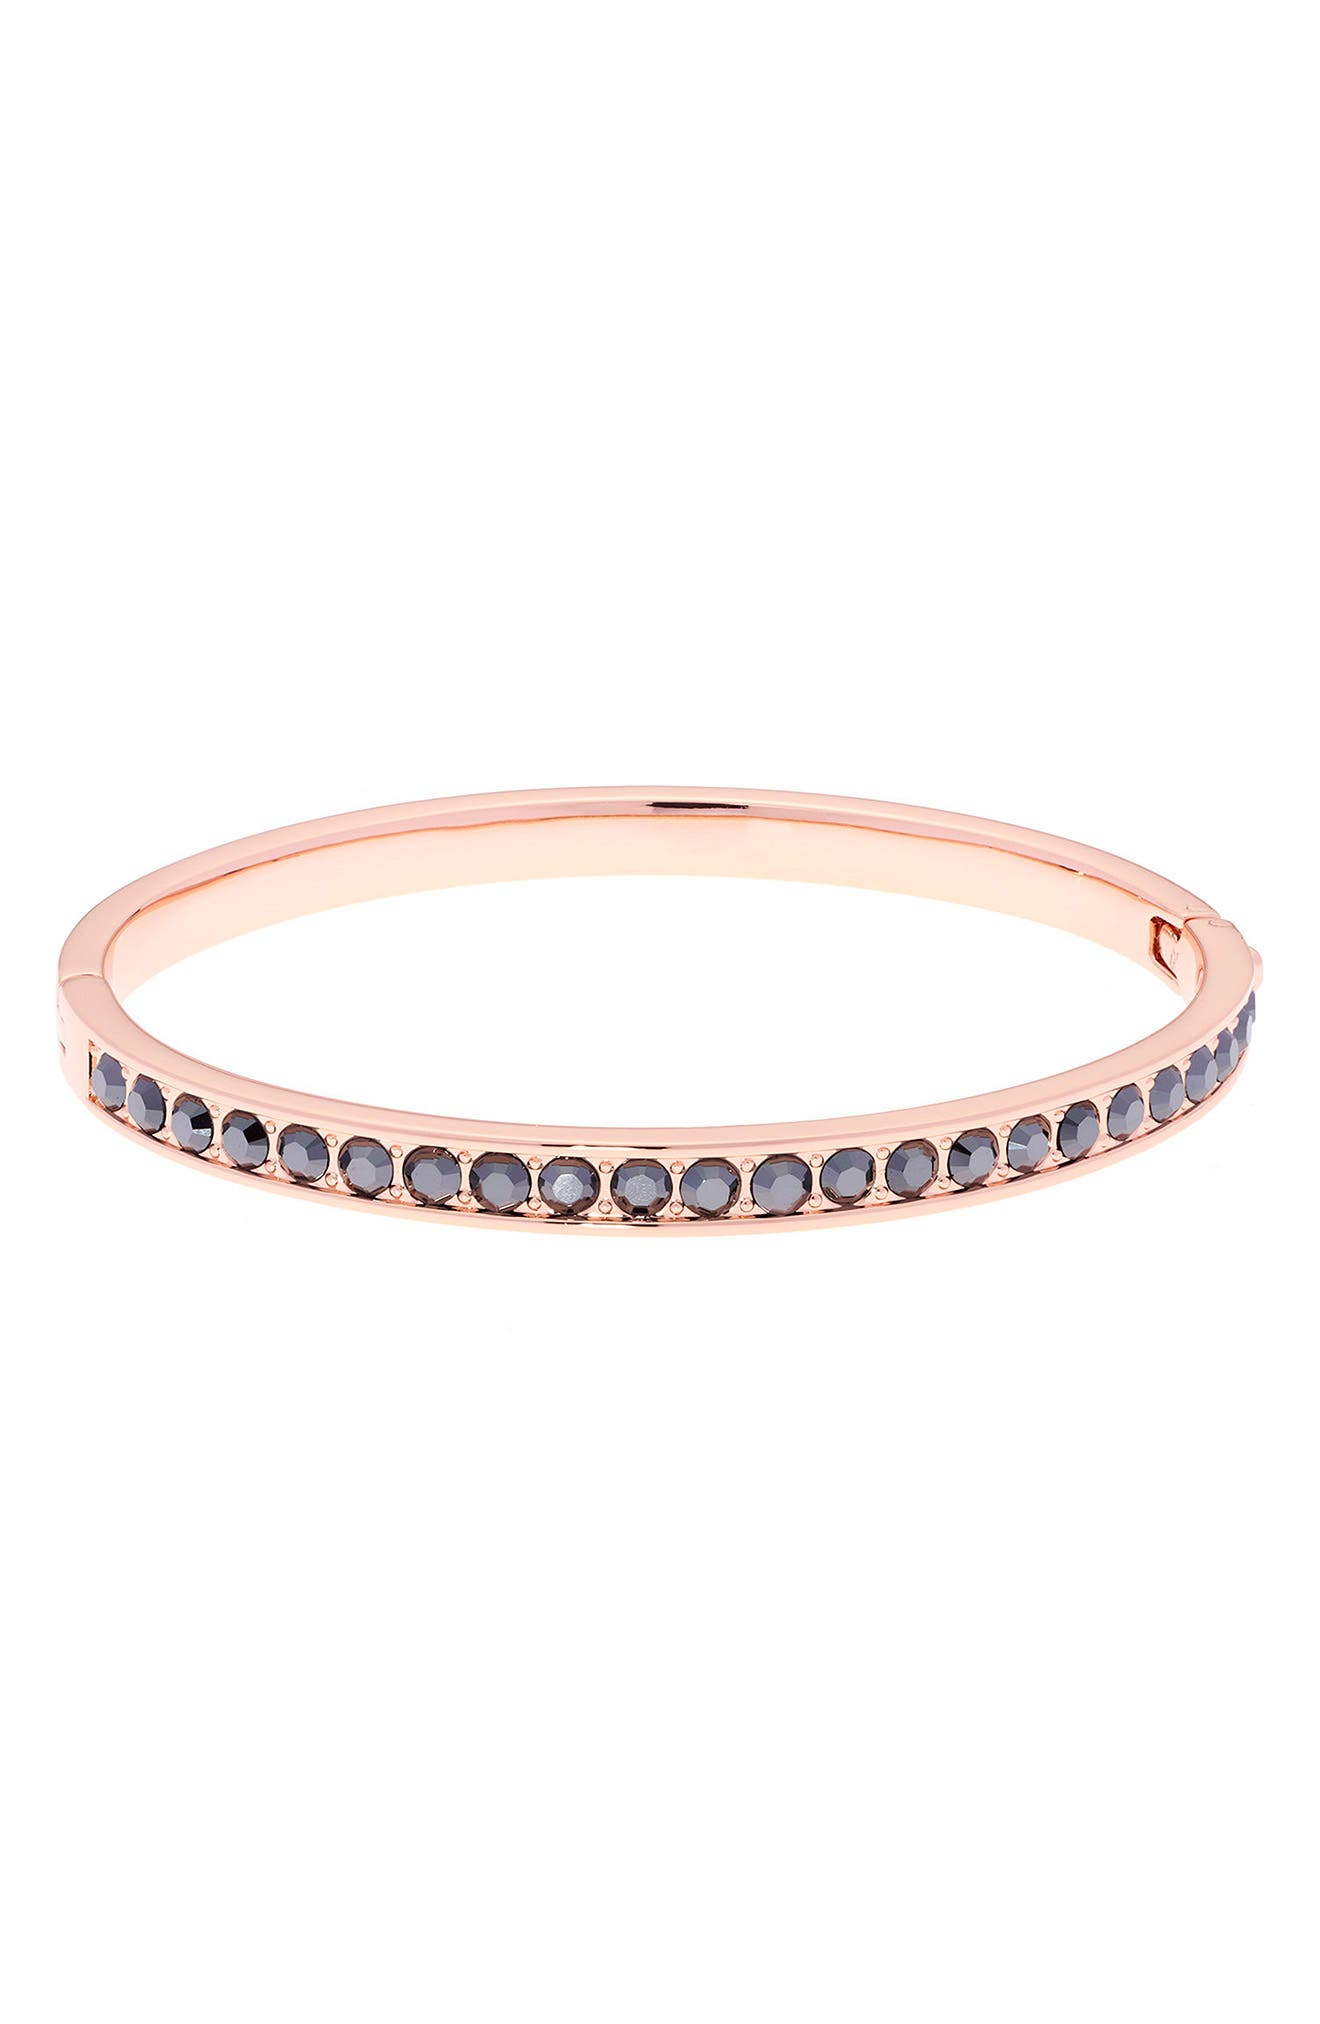 Clemara Hinge Bangle Bracelet,                         Main,                         color, 001